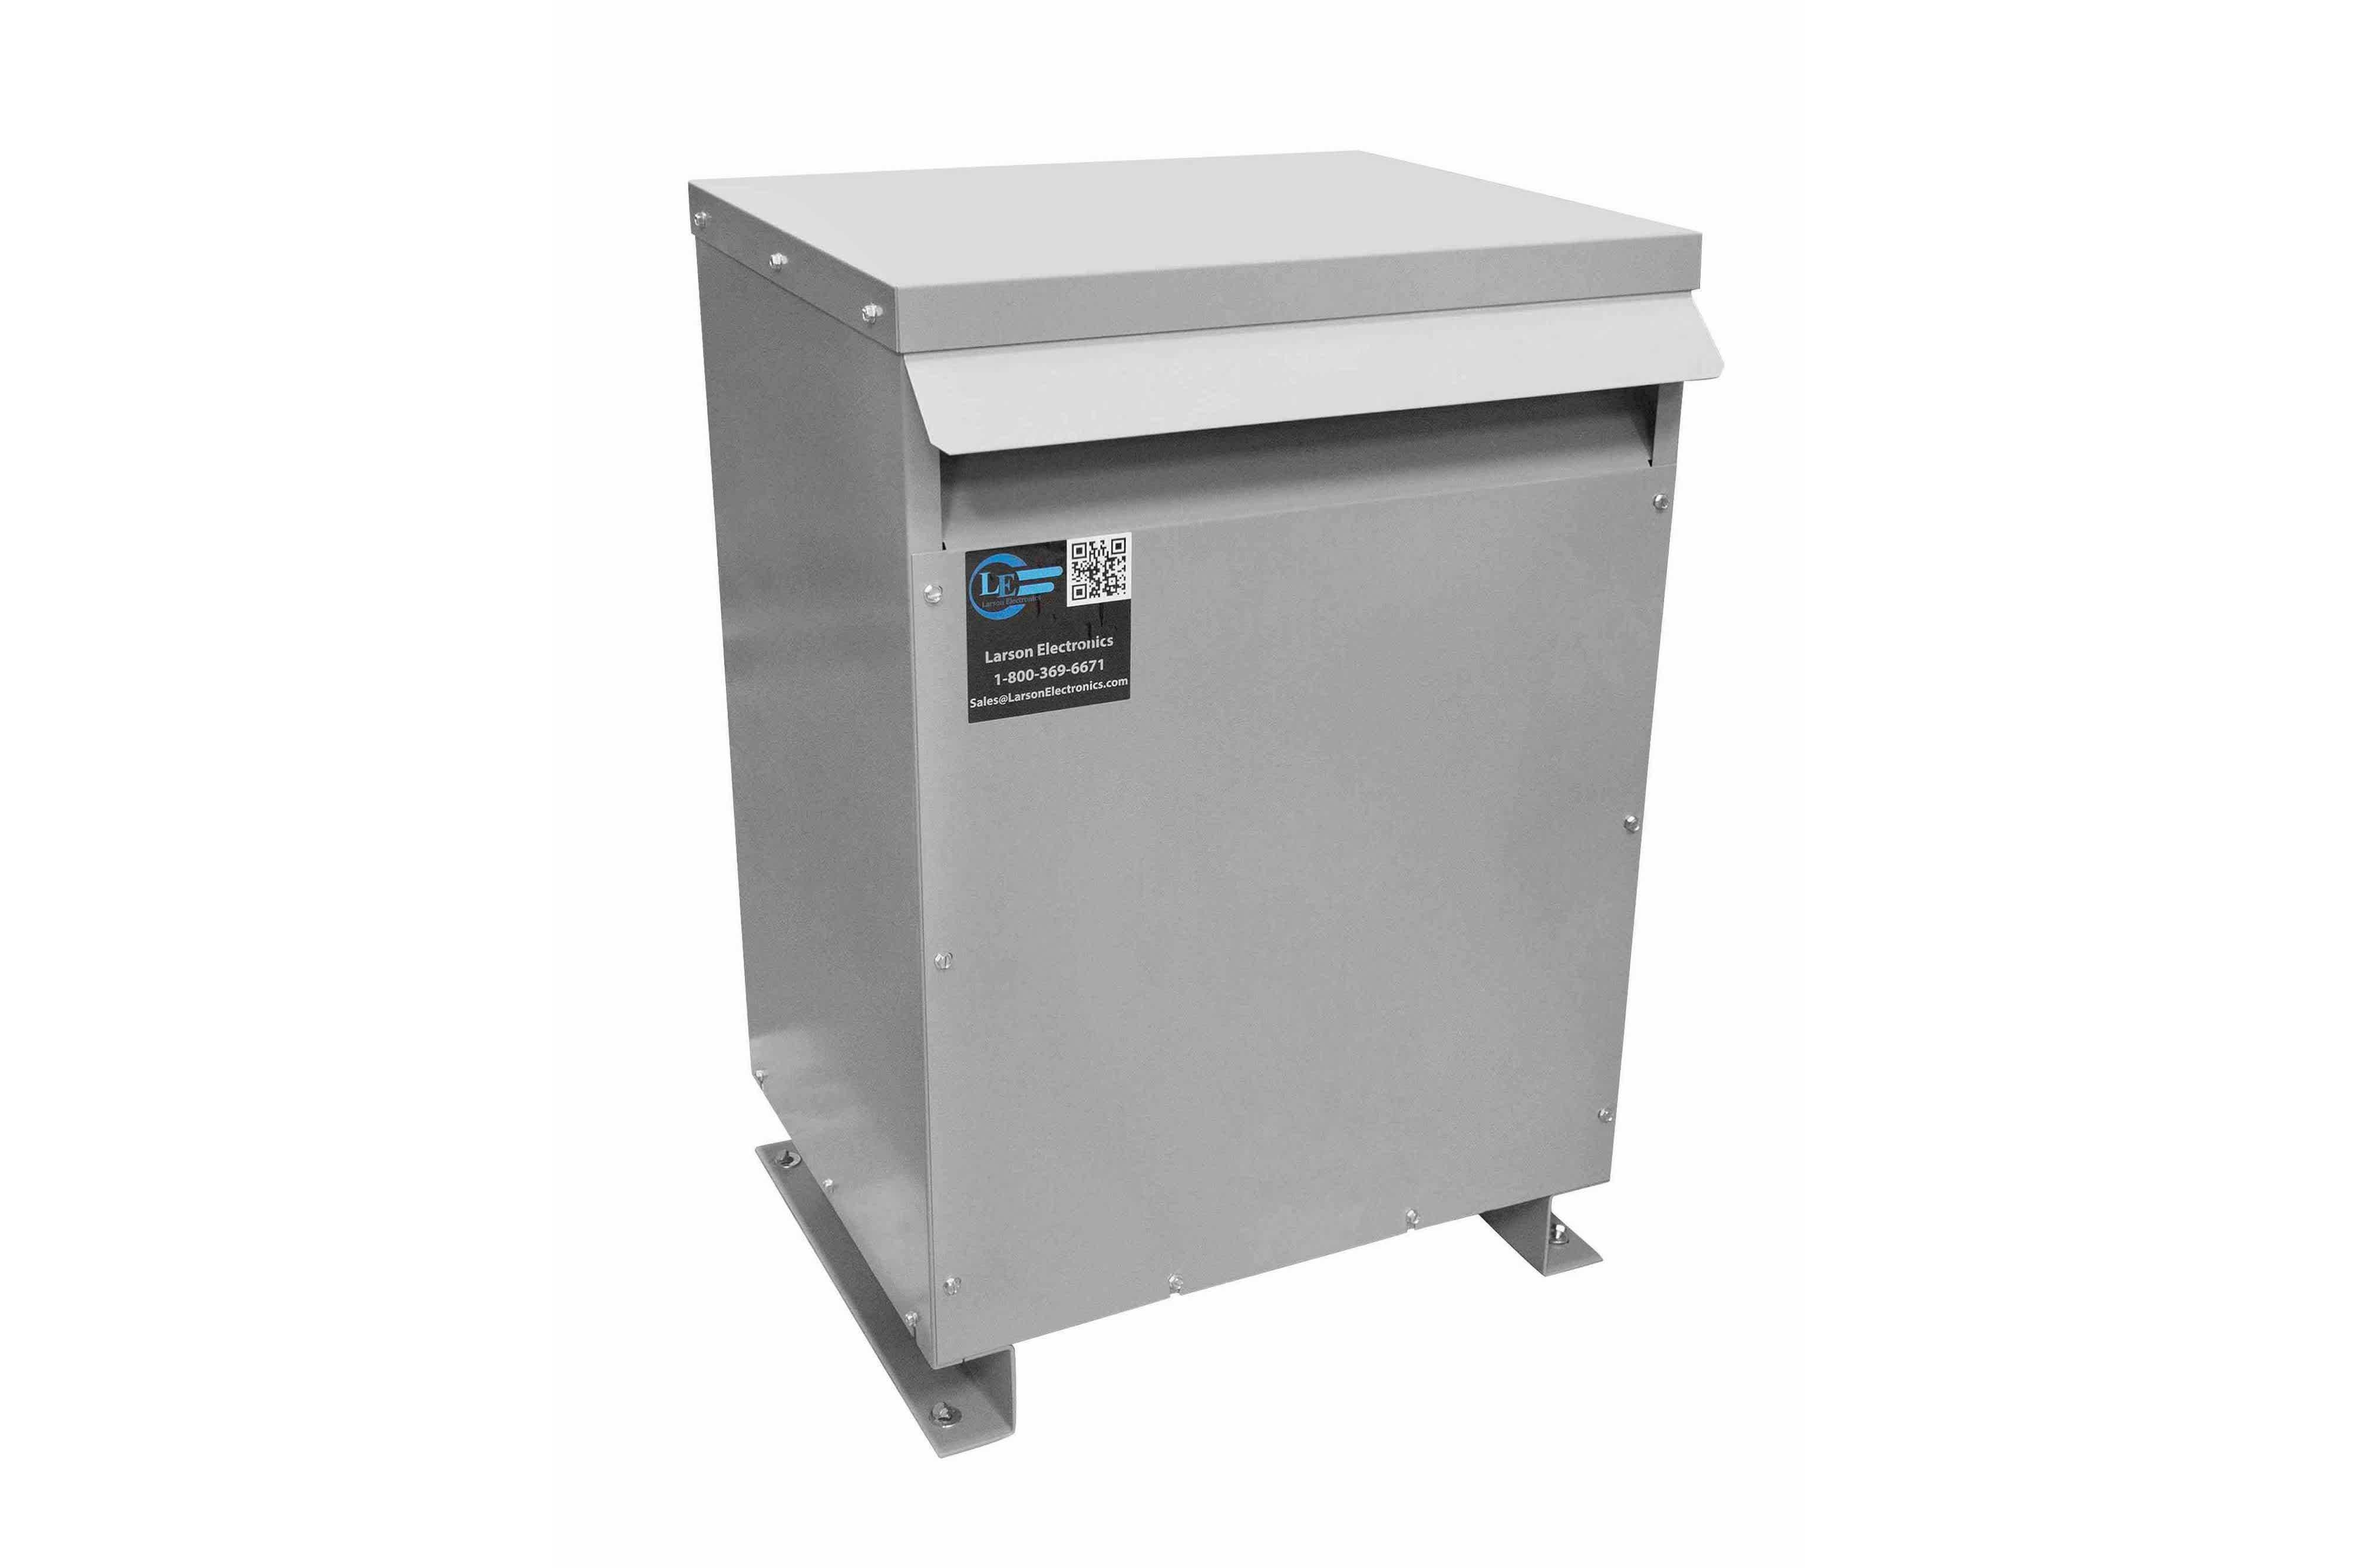 500 kVA 3PH Isolation Transformer, 575V Wye Primary, 400Y/231 Wye-N Secondary, N3R, Ventilated, 60 Hz